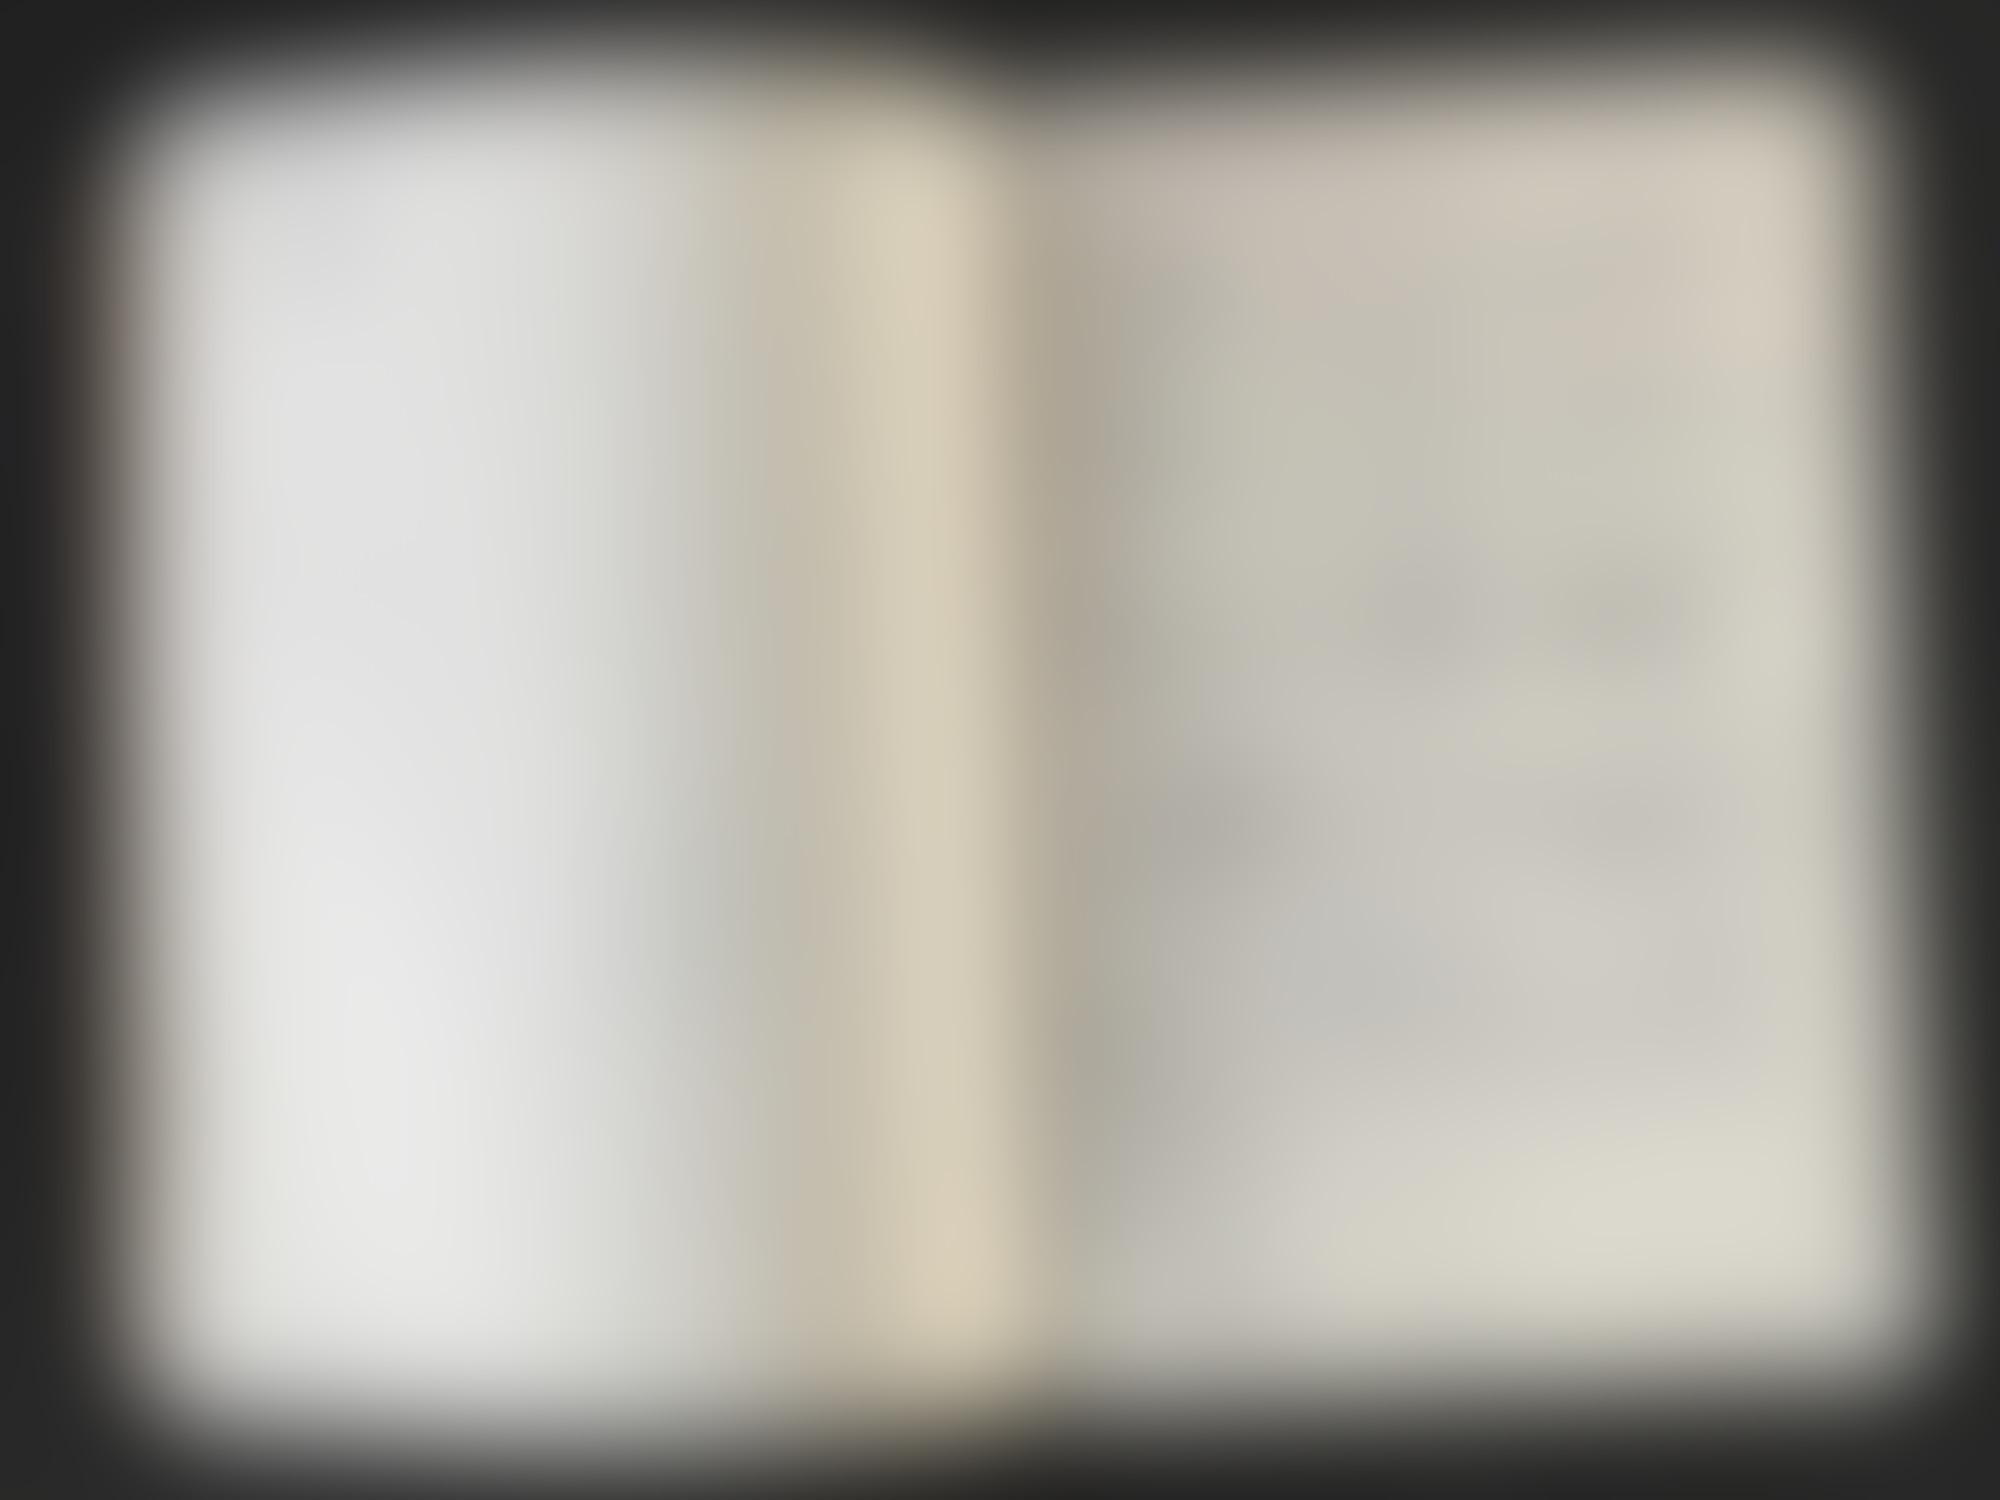 Bob SKETCHES dragged 16 autocompressfitresizeixlibphp 1 1 0max h2000max w3 D2000q80seef51bb1570104e0ff6afb4c8e3989c0